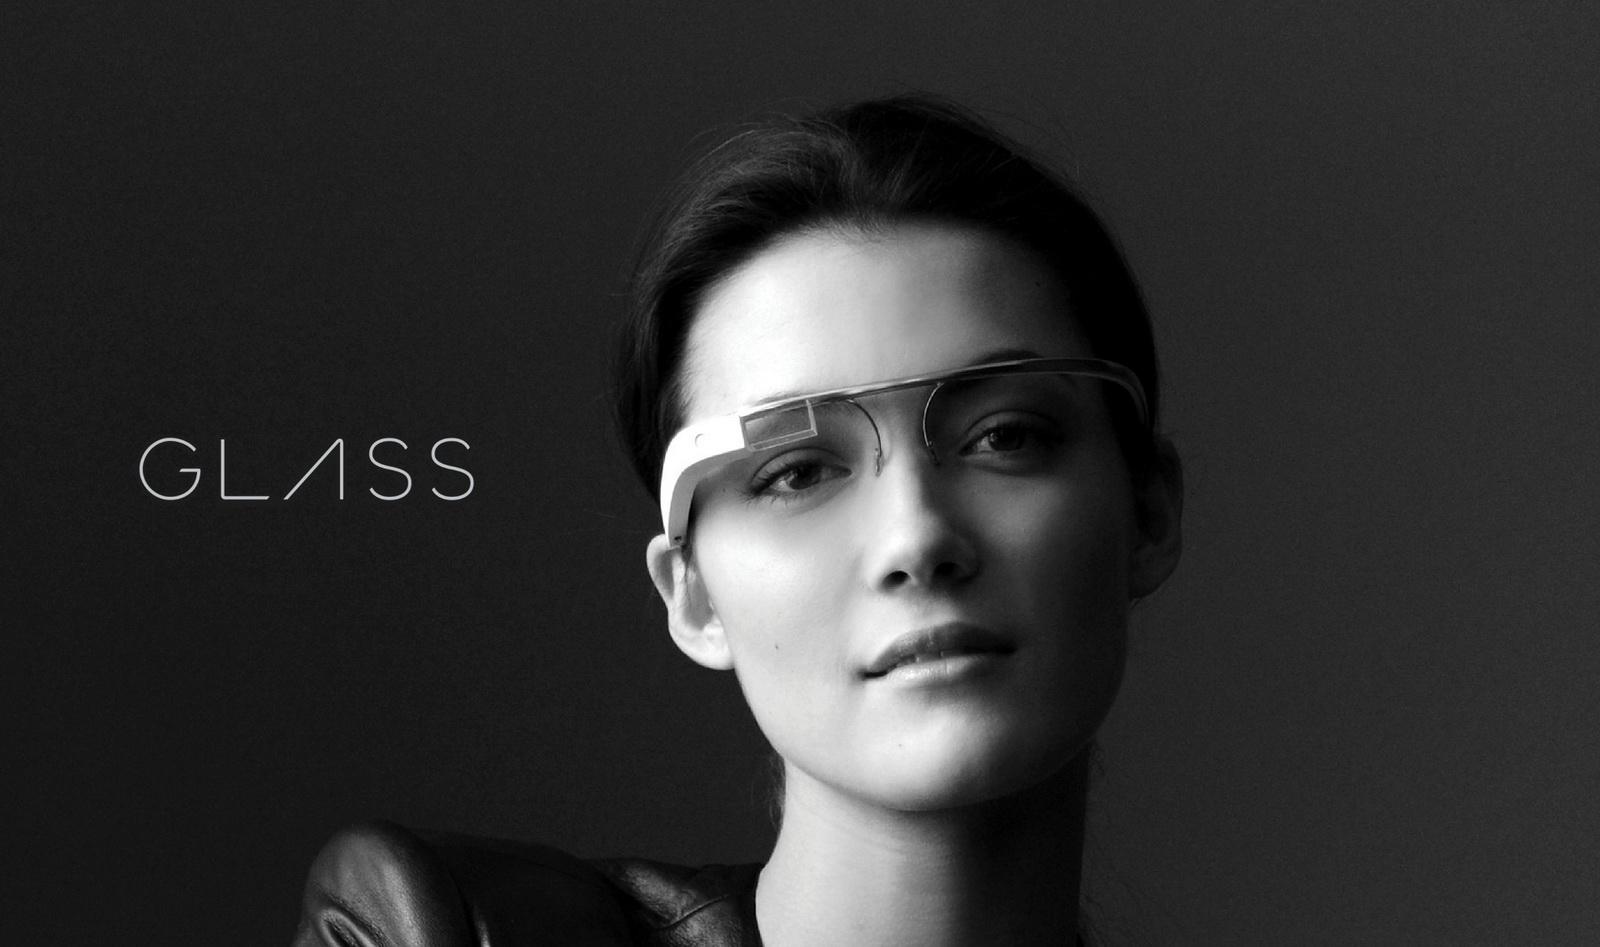 The 5 Best Alternatives to Google Glass